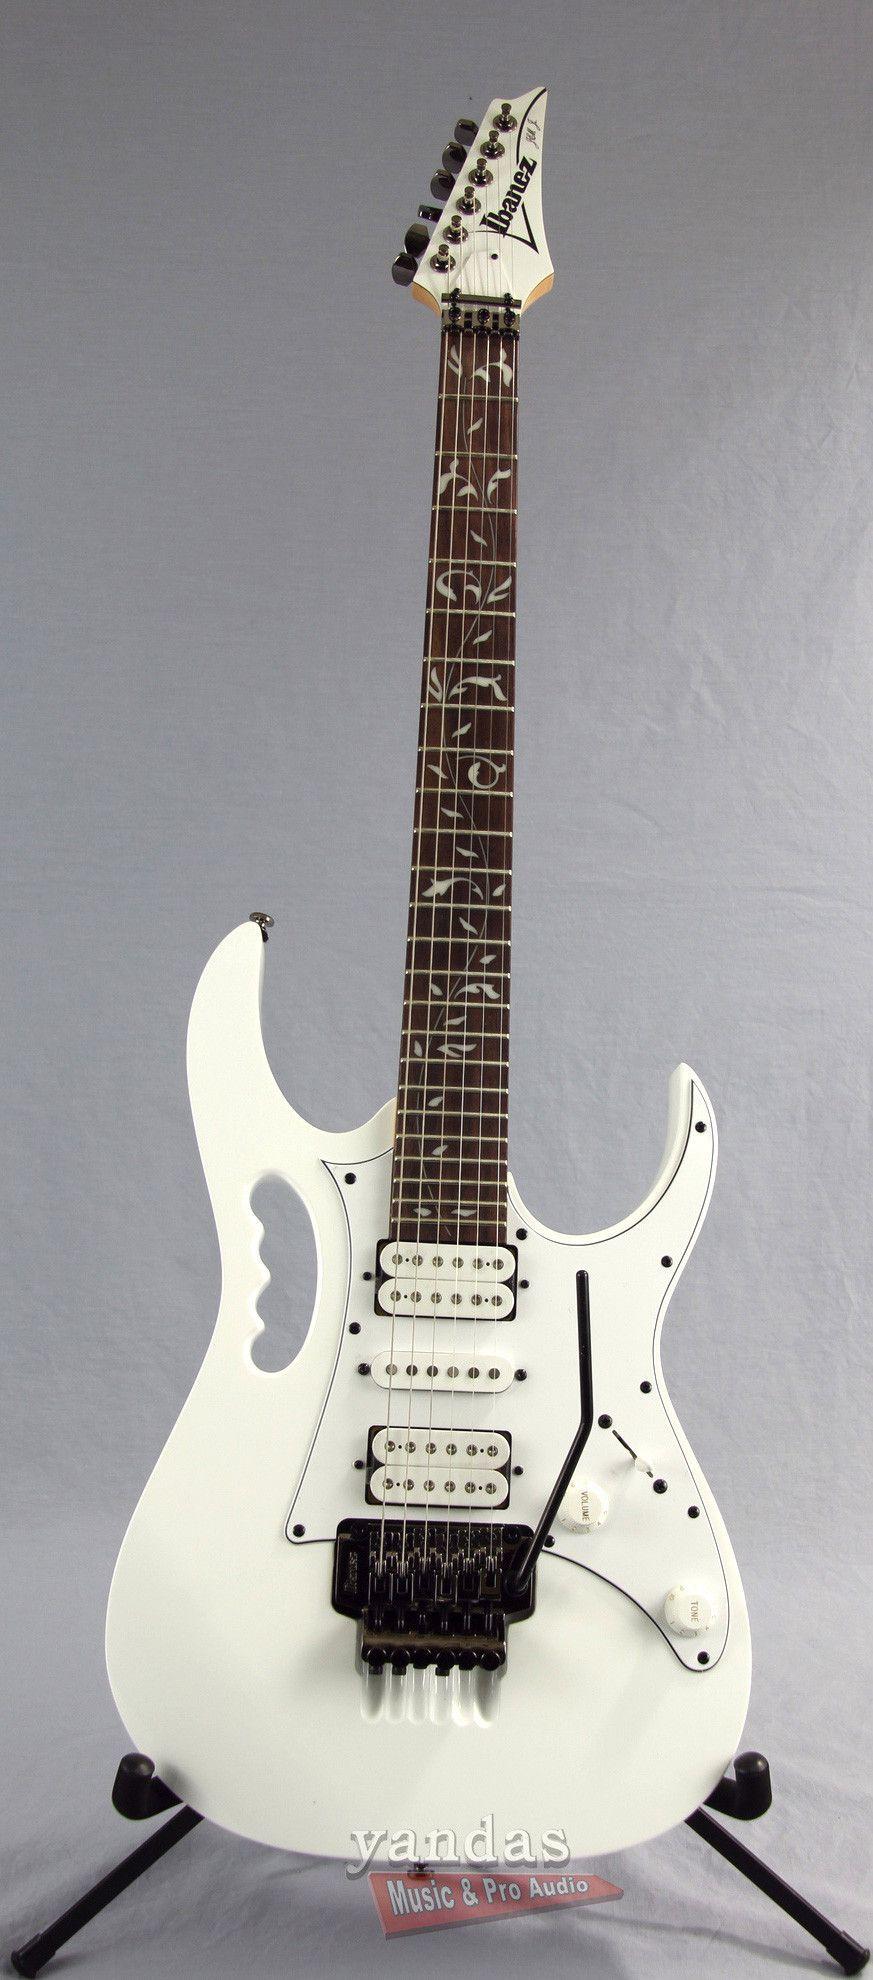 ibanez jem jr steve vai signature electric guitar les paul gallery guitar guitar musical. Black Bedroom Furniture Sets. Home Design Ideas